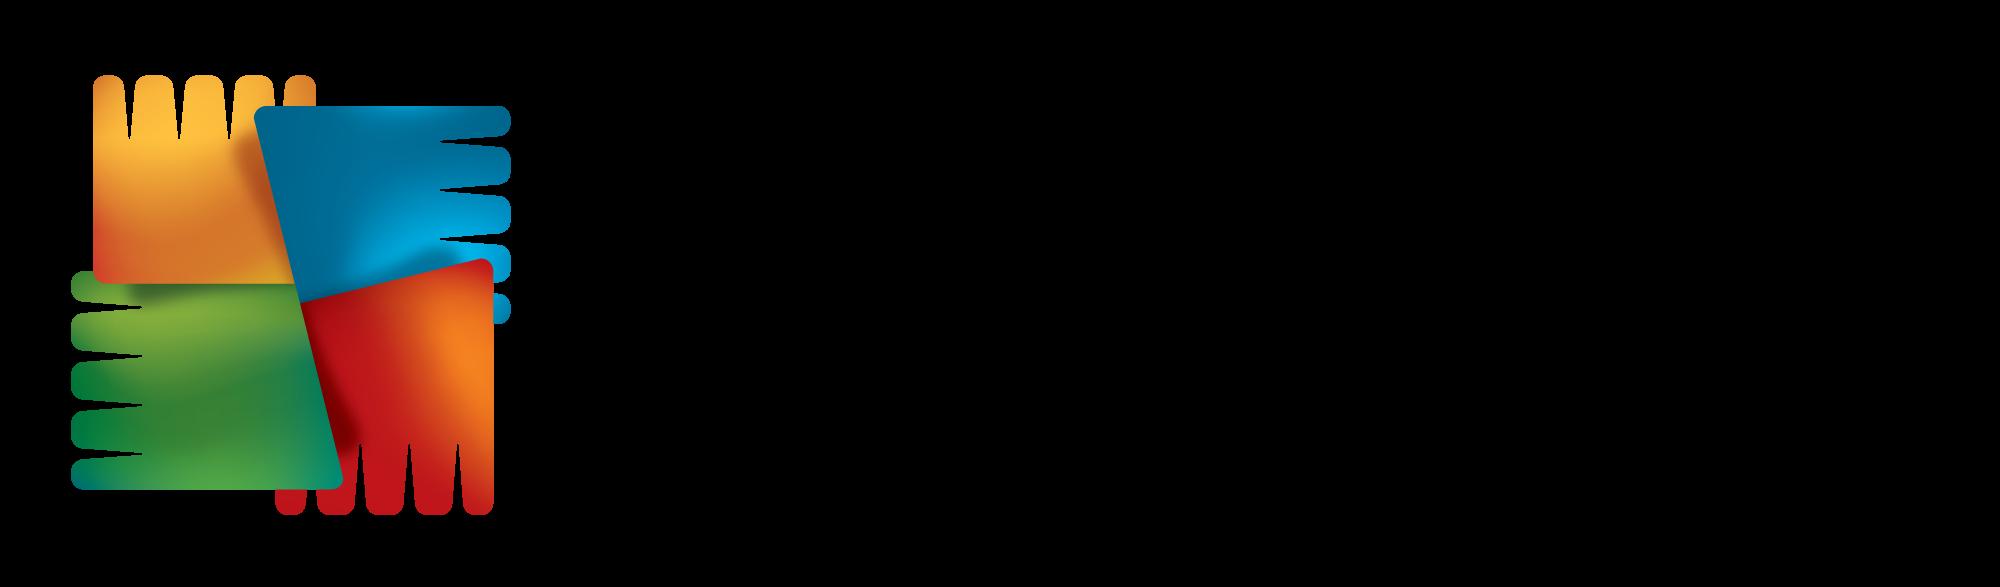 AVG_2011_AUNZ_logo_v2.png